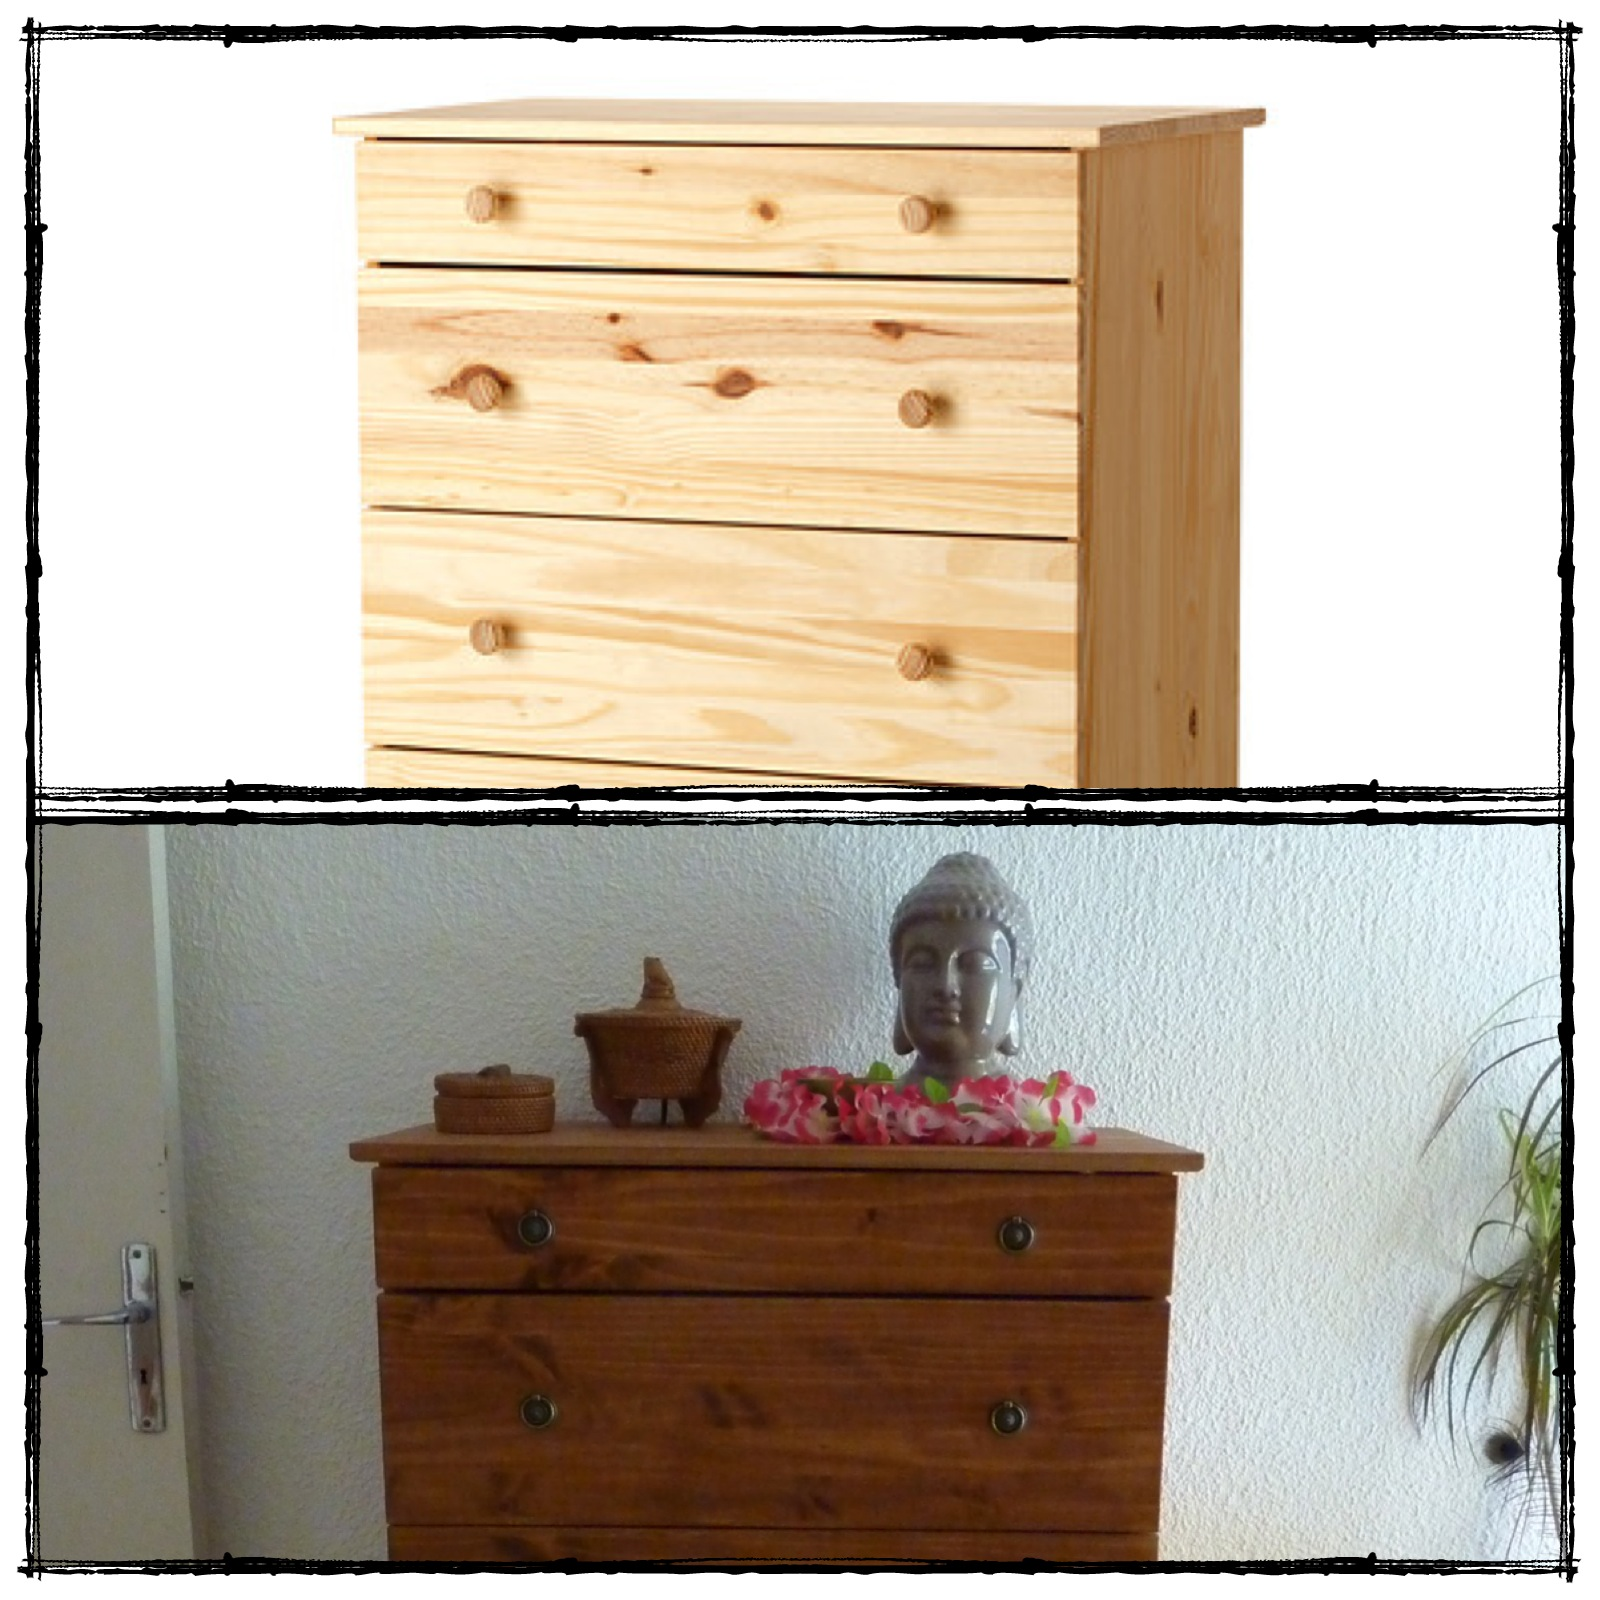 avant apr s relooker une commode en pin initiales gg. Black Bedroom Furniture Sets. Home Design Ideas